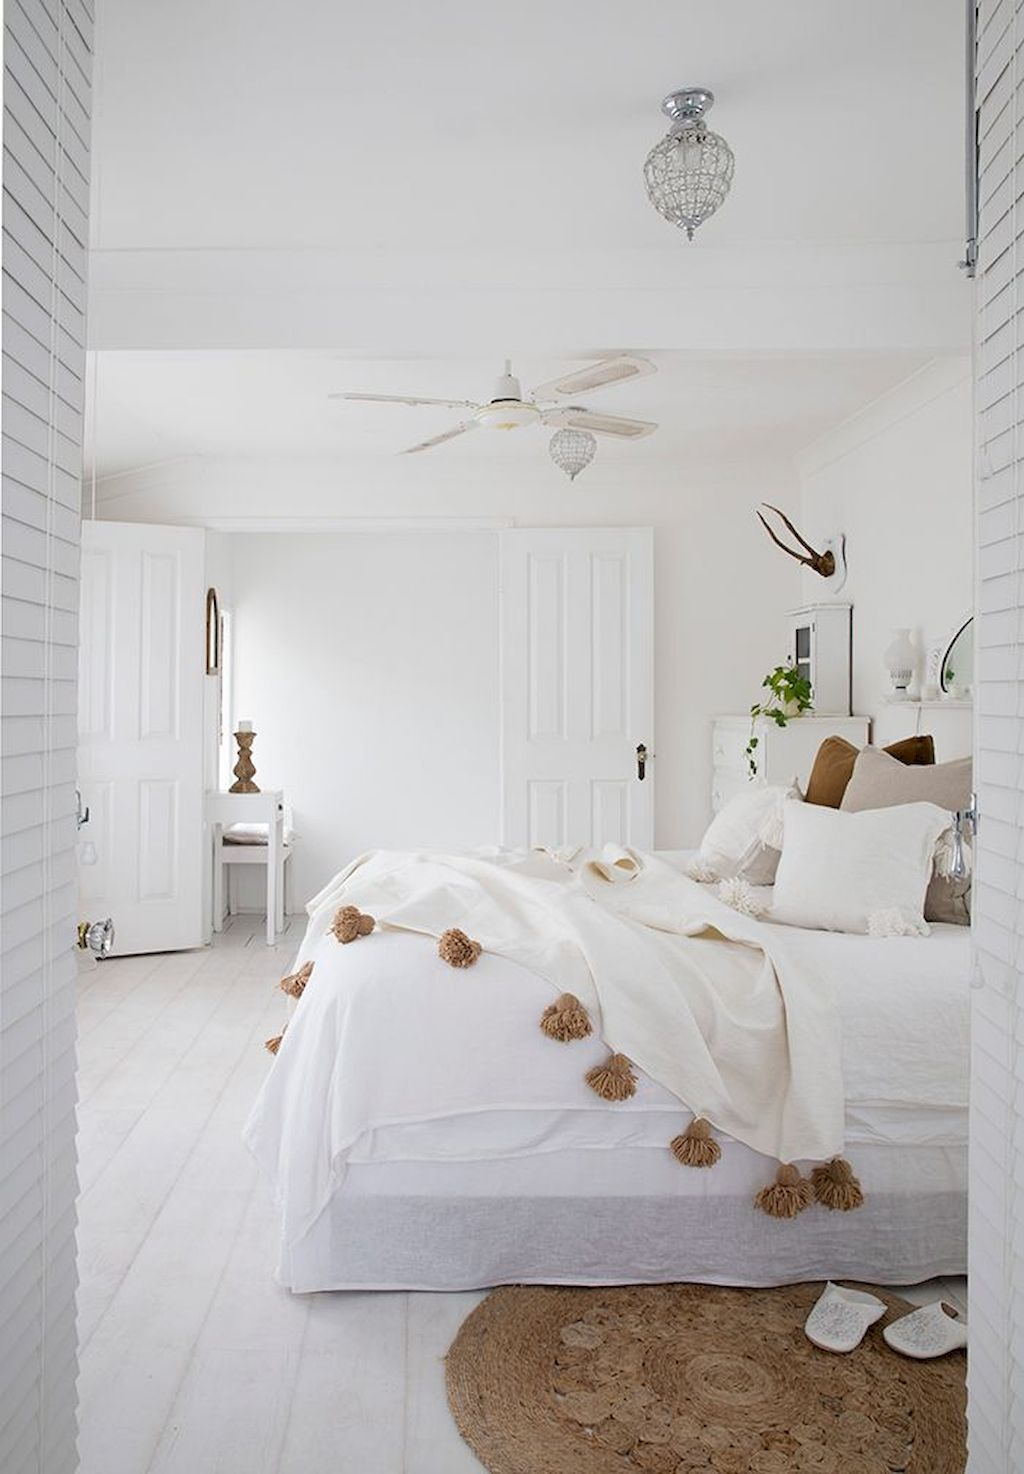 Awesome 85 Bohemian Style Modern Bedroom Decor Ideas Https Homespecially Com 85 Bohemian Style Modern Be Modern Bedroom Decor Bedroom Design Cheap Home Decor